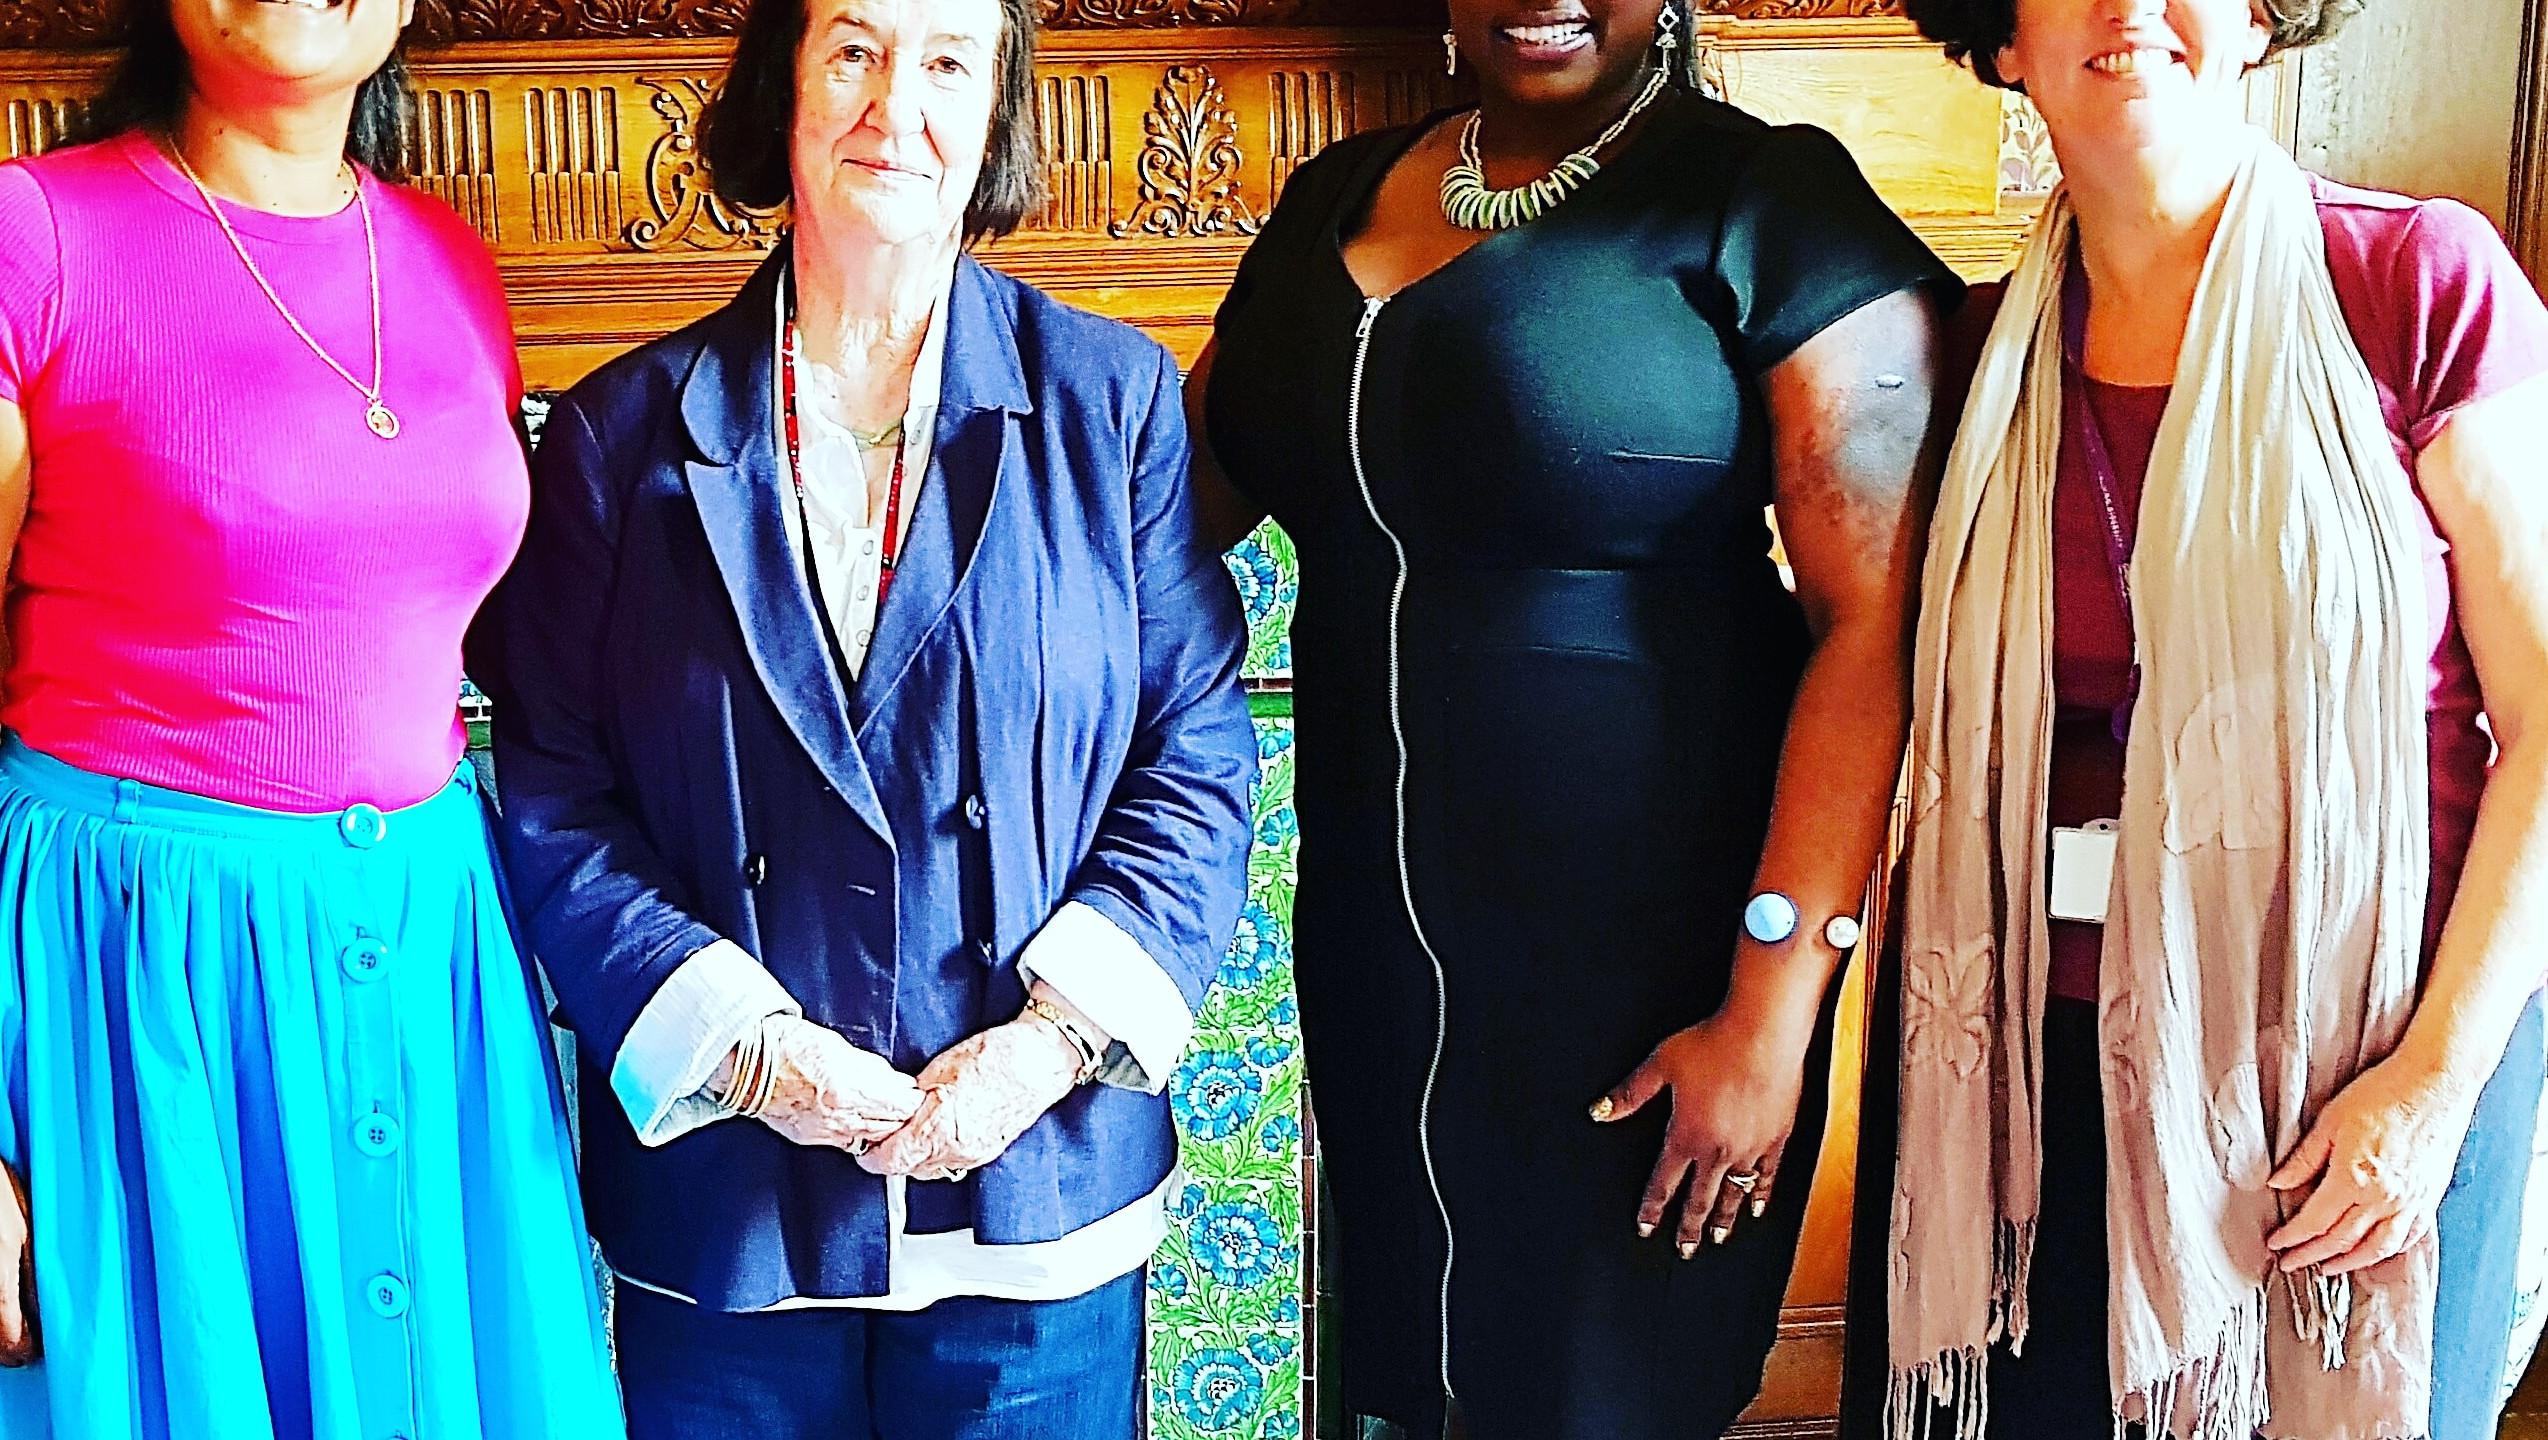 (L-R) Artist Salina Jane, The Worshipful Mayor of Croydon Cllr Bernadette Khan, caribArt Artistic Director Tricia Trotman Maraj and Paula Murray Creative Director Croydon Council